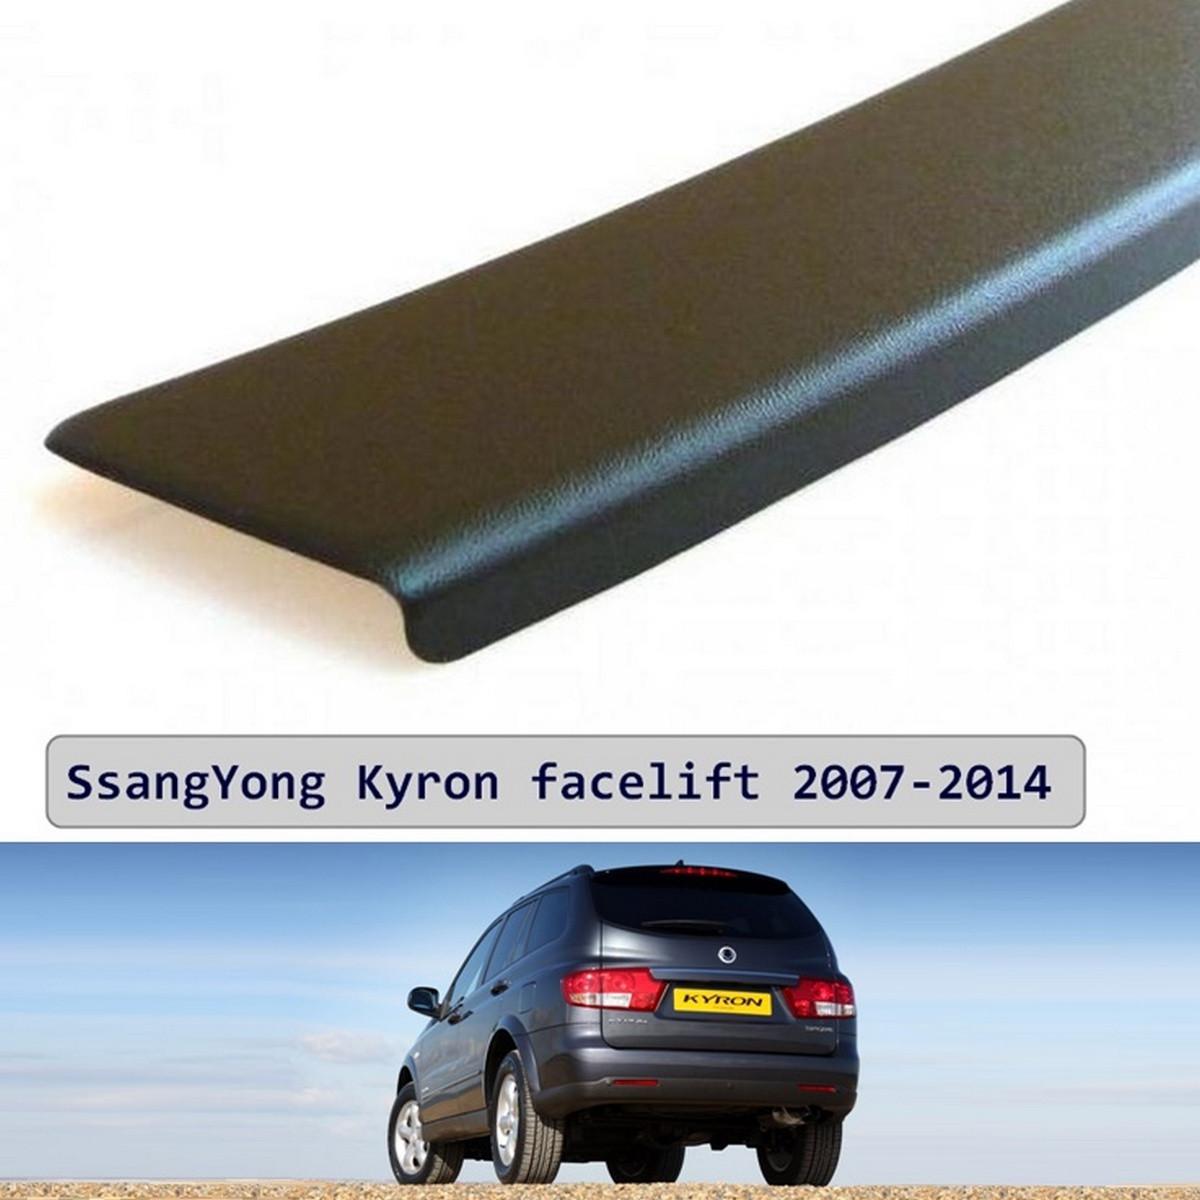 SsangYong Kyron 2007- 2014 facelift пластиковая защитная накладка заднего бампера